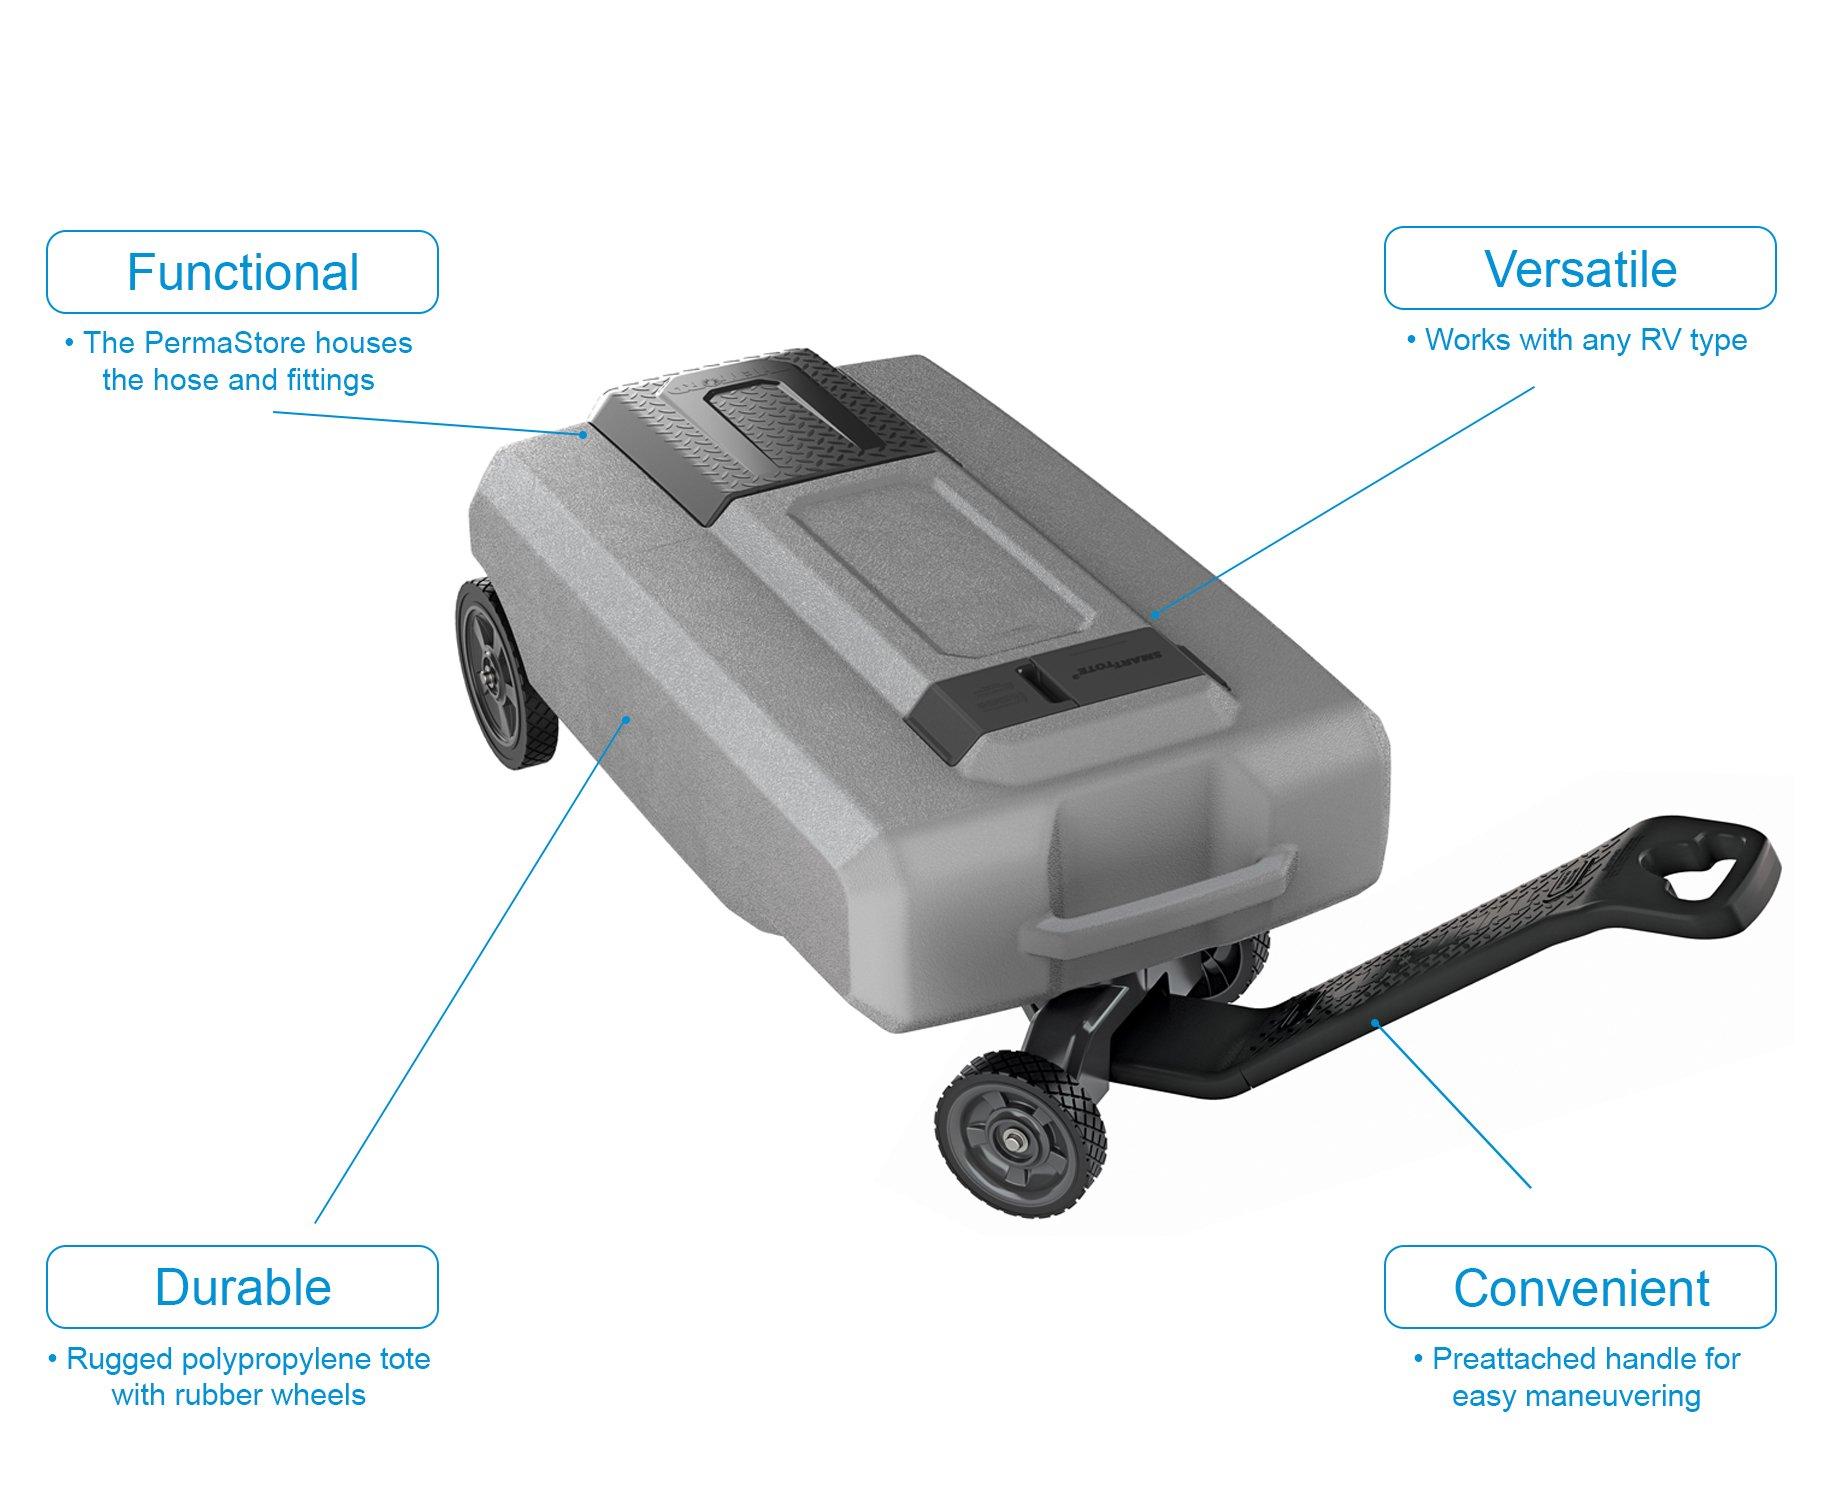 SmartTote2 40518 LX Portable RV Waste Tote Tank-4 Wheels-27 Gallons-Thetford-40518 by SmartTote2 (Image #6)